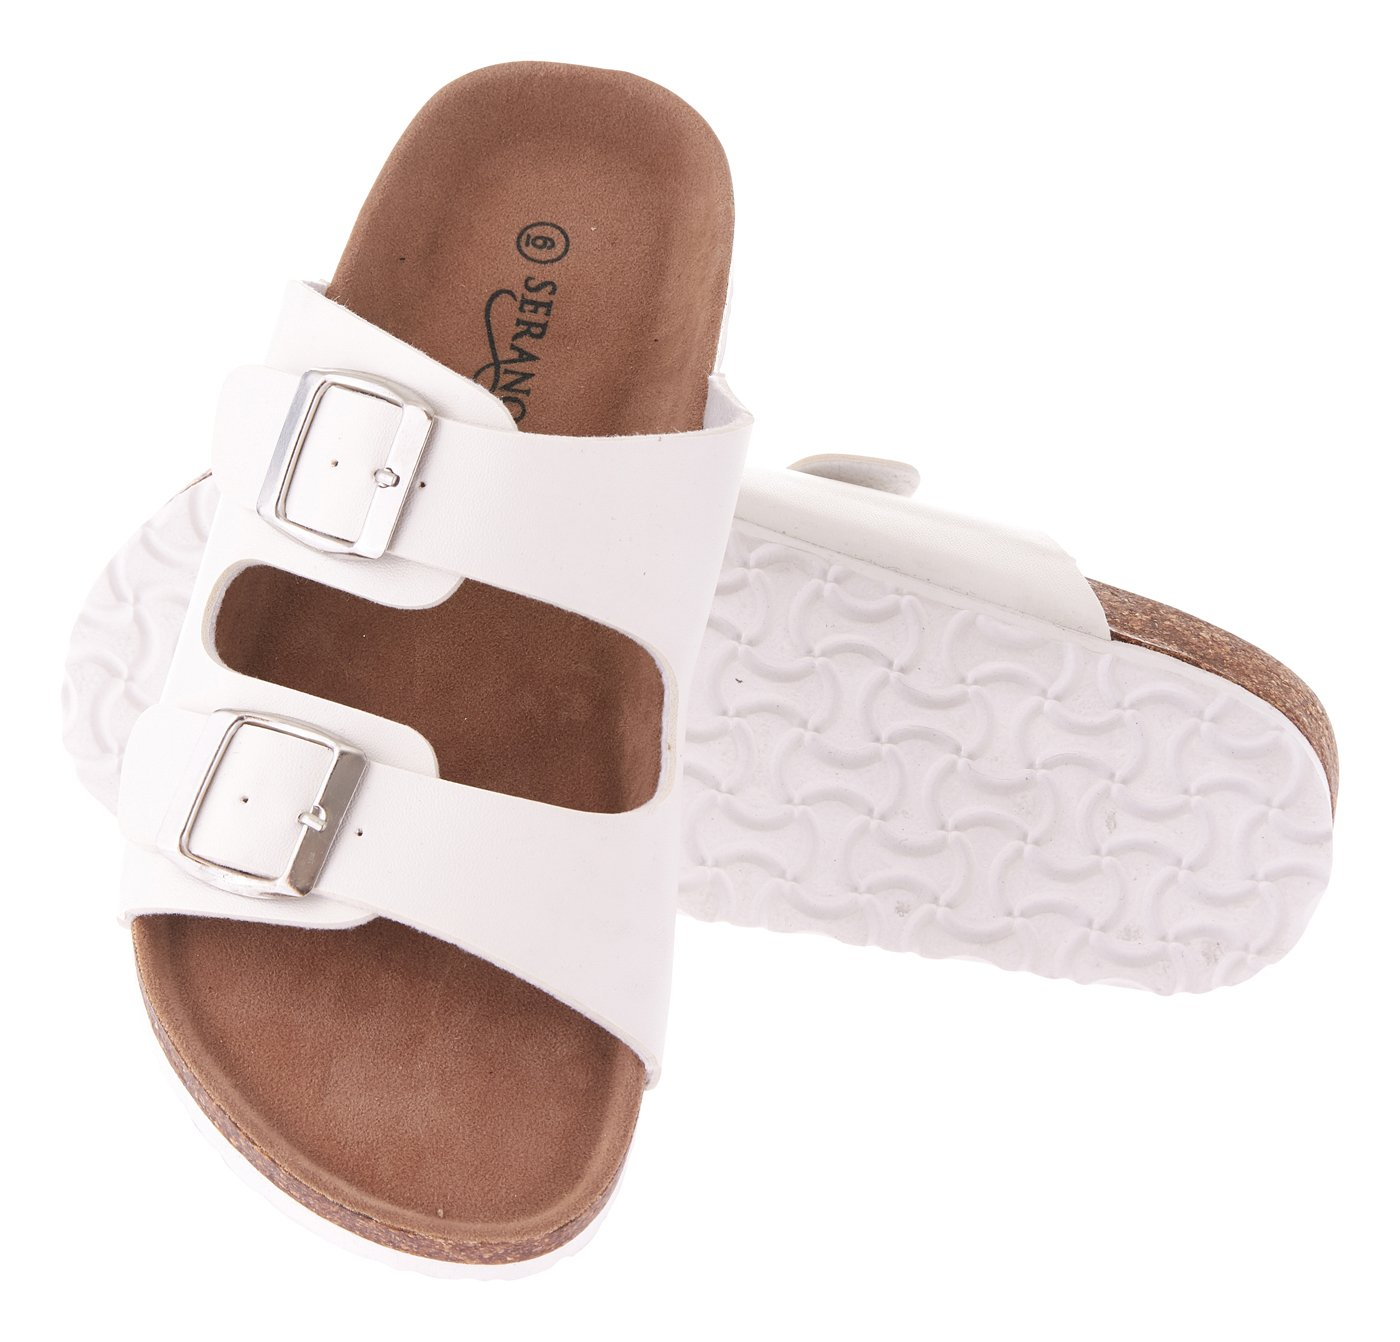 Seranoma Women's Comfortable Cork Sandals - Casual Slide for Spring/Summer